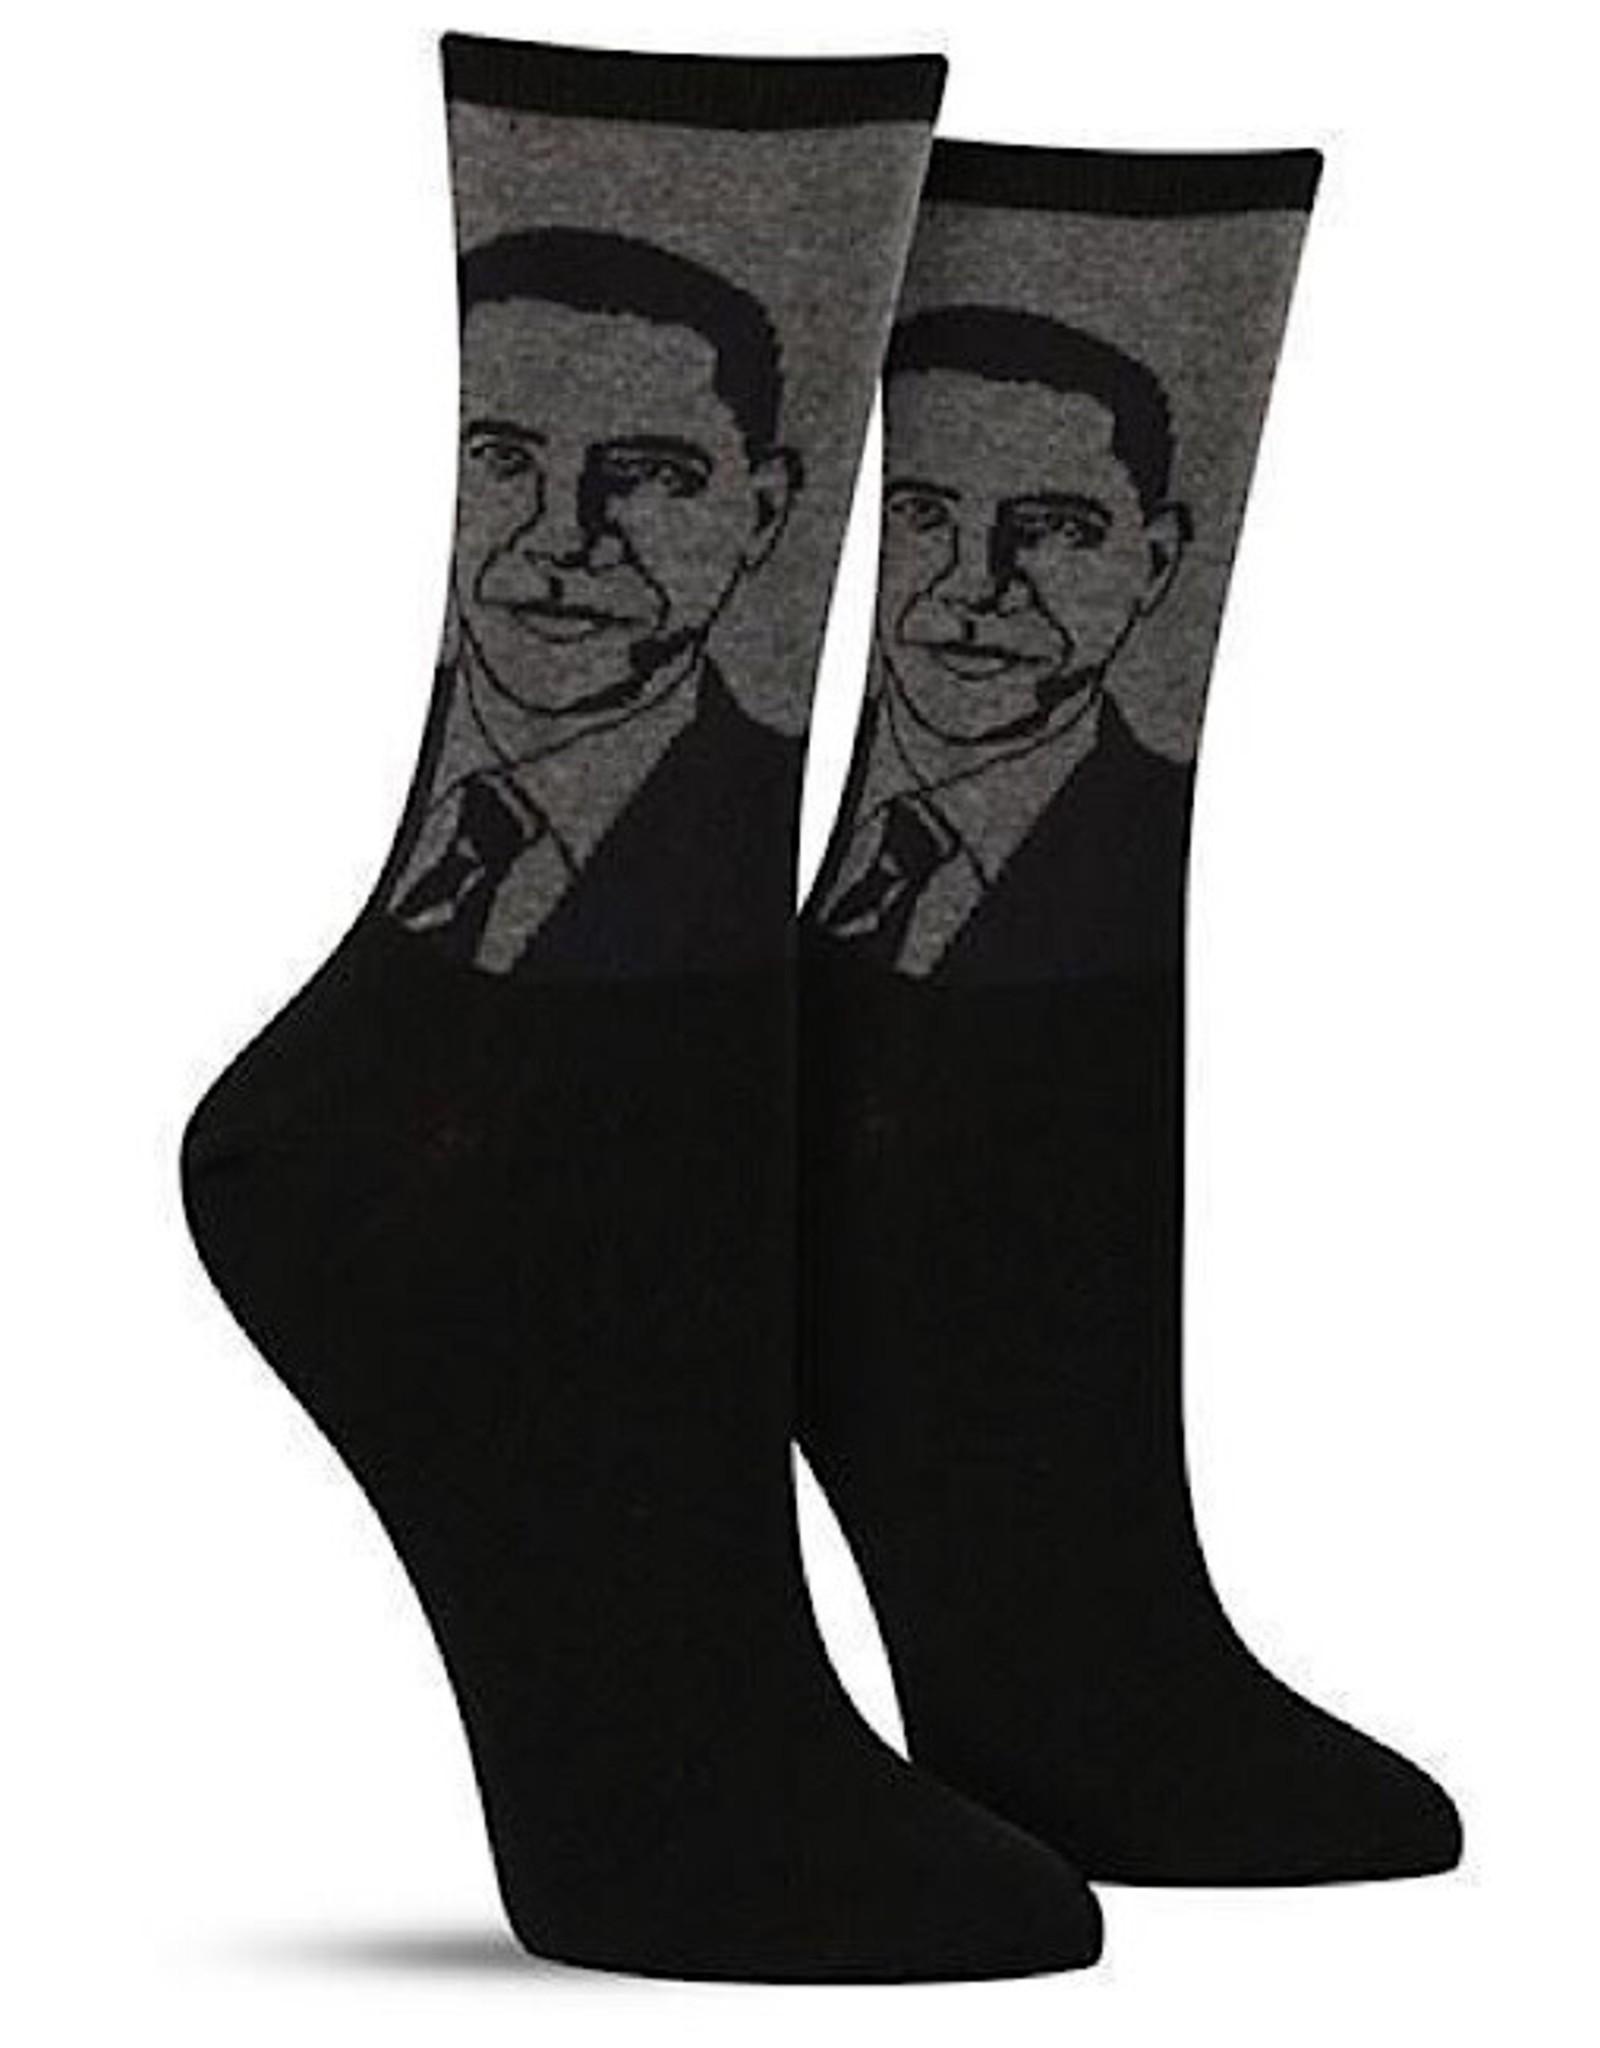 Socks (Womens) - Obama